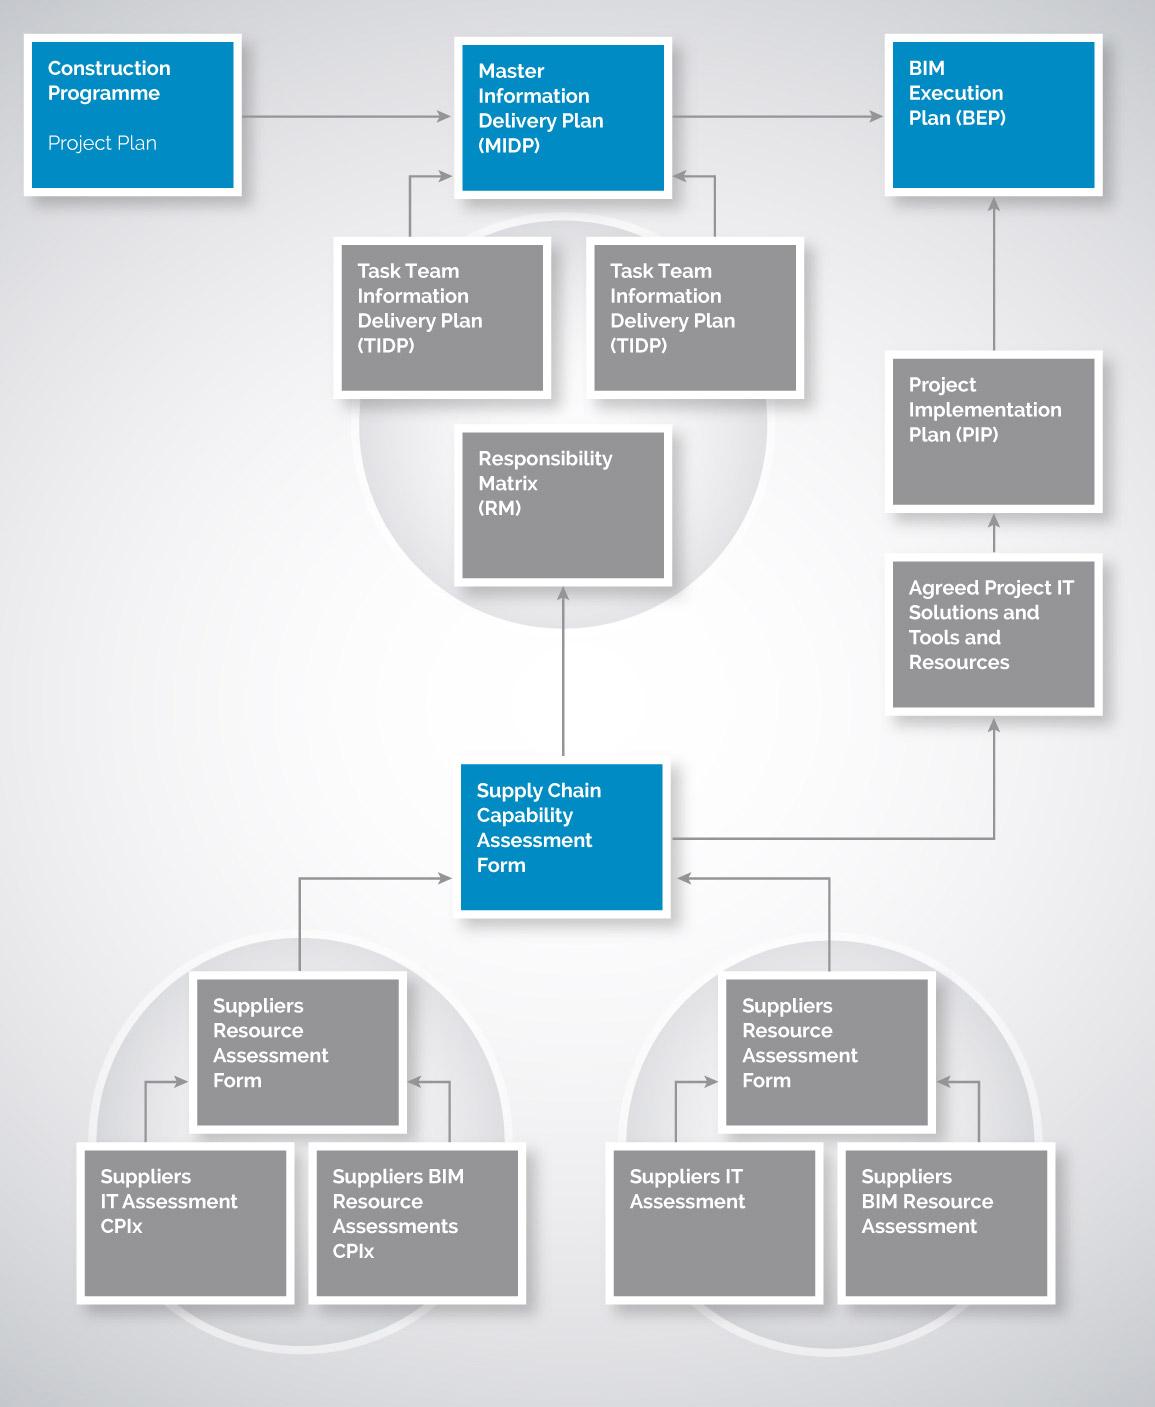 task supply chain response the bim execution plan bim level 2 guidance. Black Bedroom Furniture Sets. Home Design Ideas